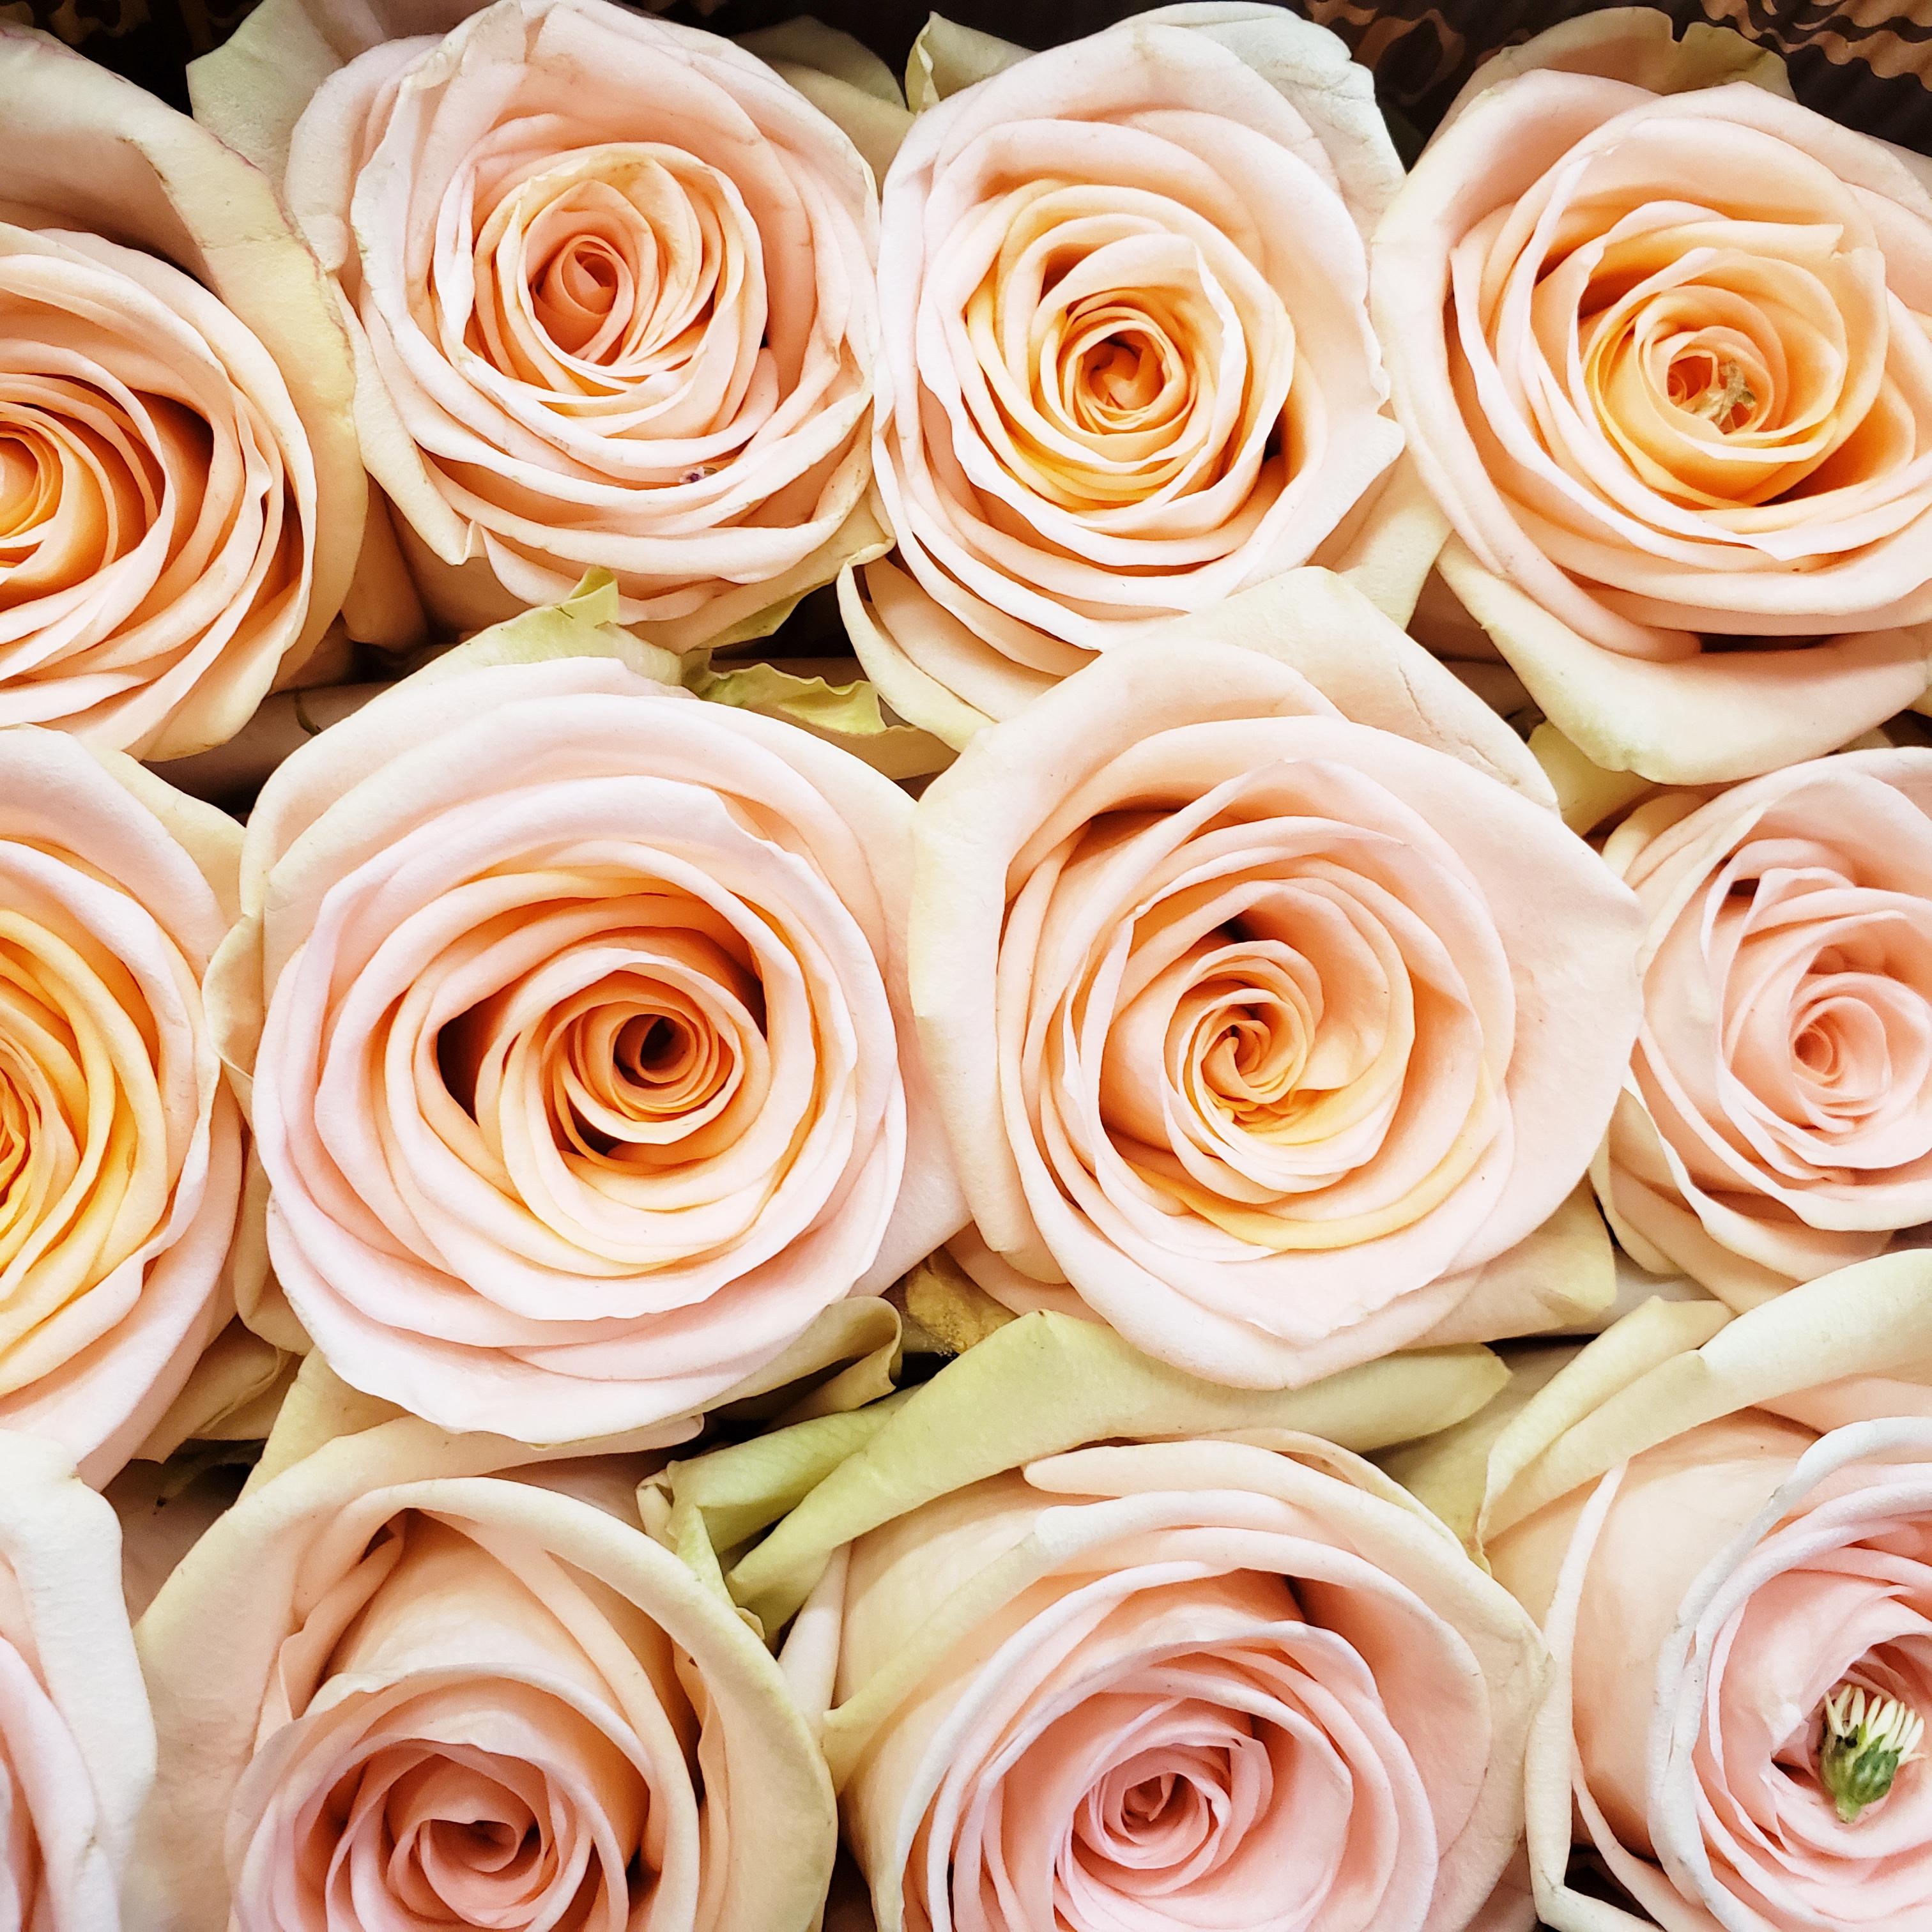 Tiffany rose.jpg